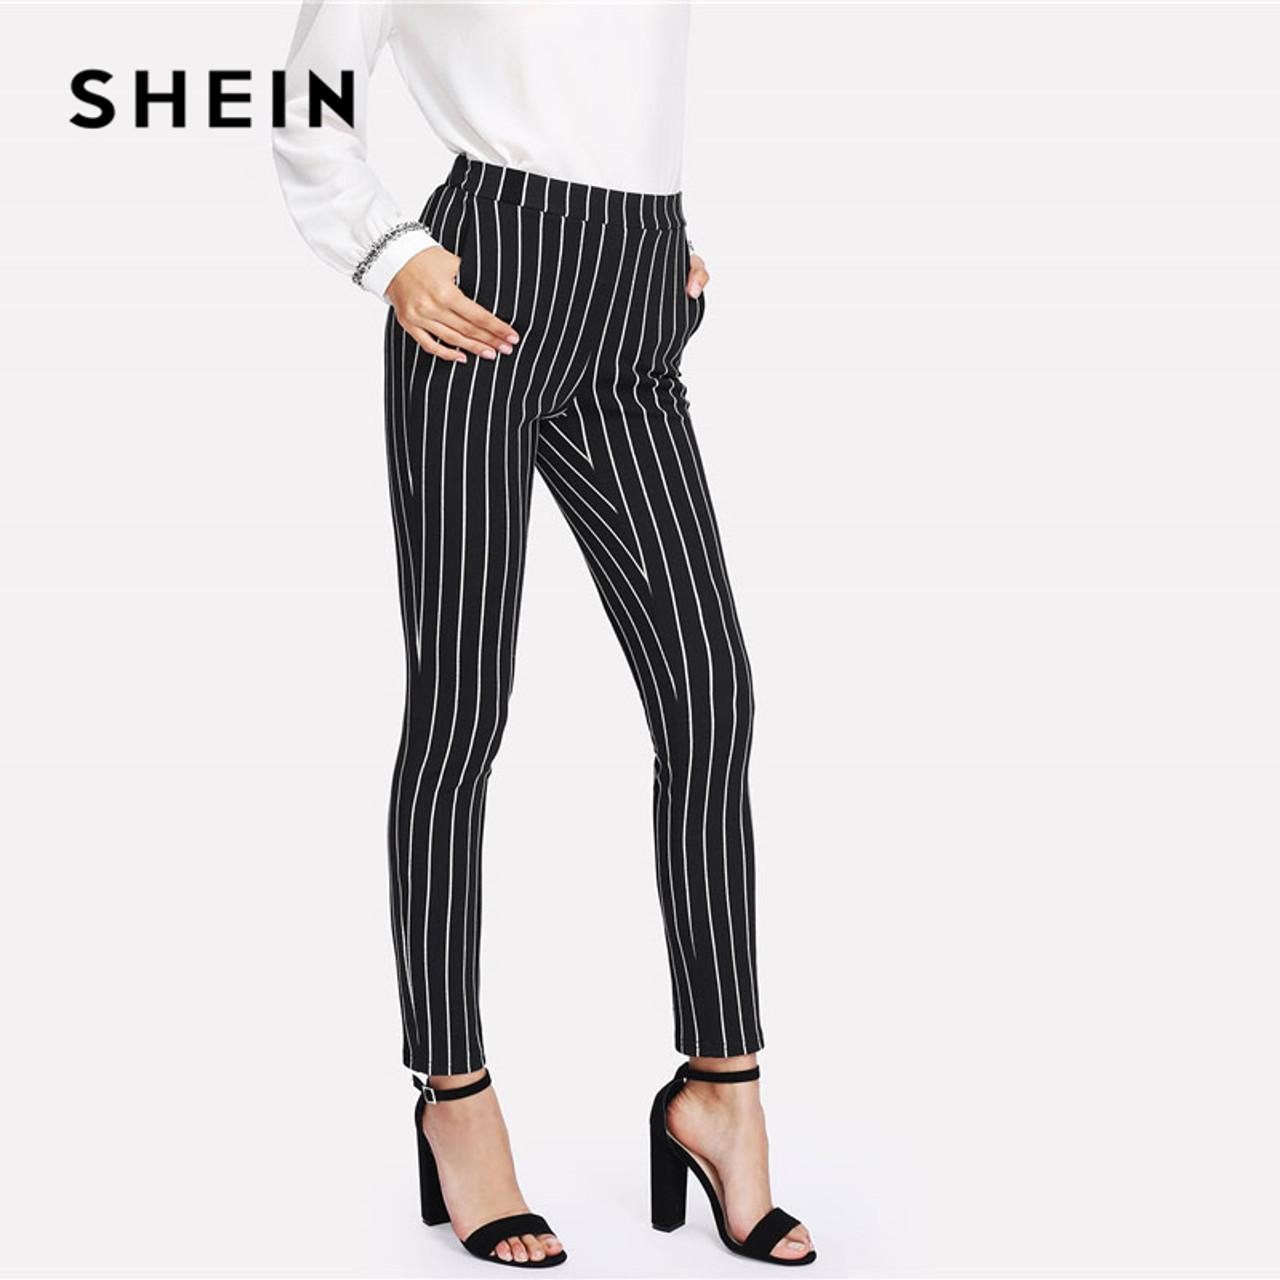 ef88cfc9ff ... SHEIN Vertical Striped Skinny Pants Women Elastic Waist Pocket OL Style  Work Trousers 2018 Spring Mid ...